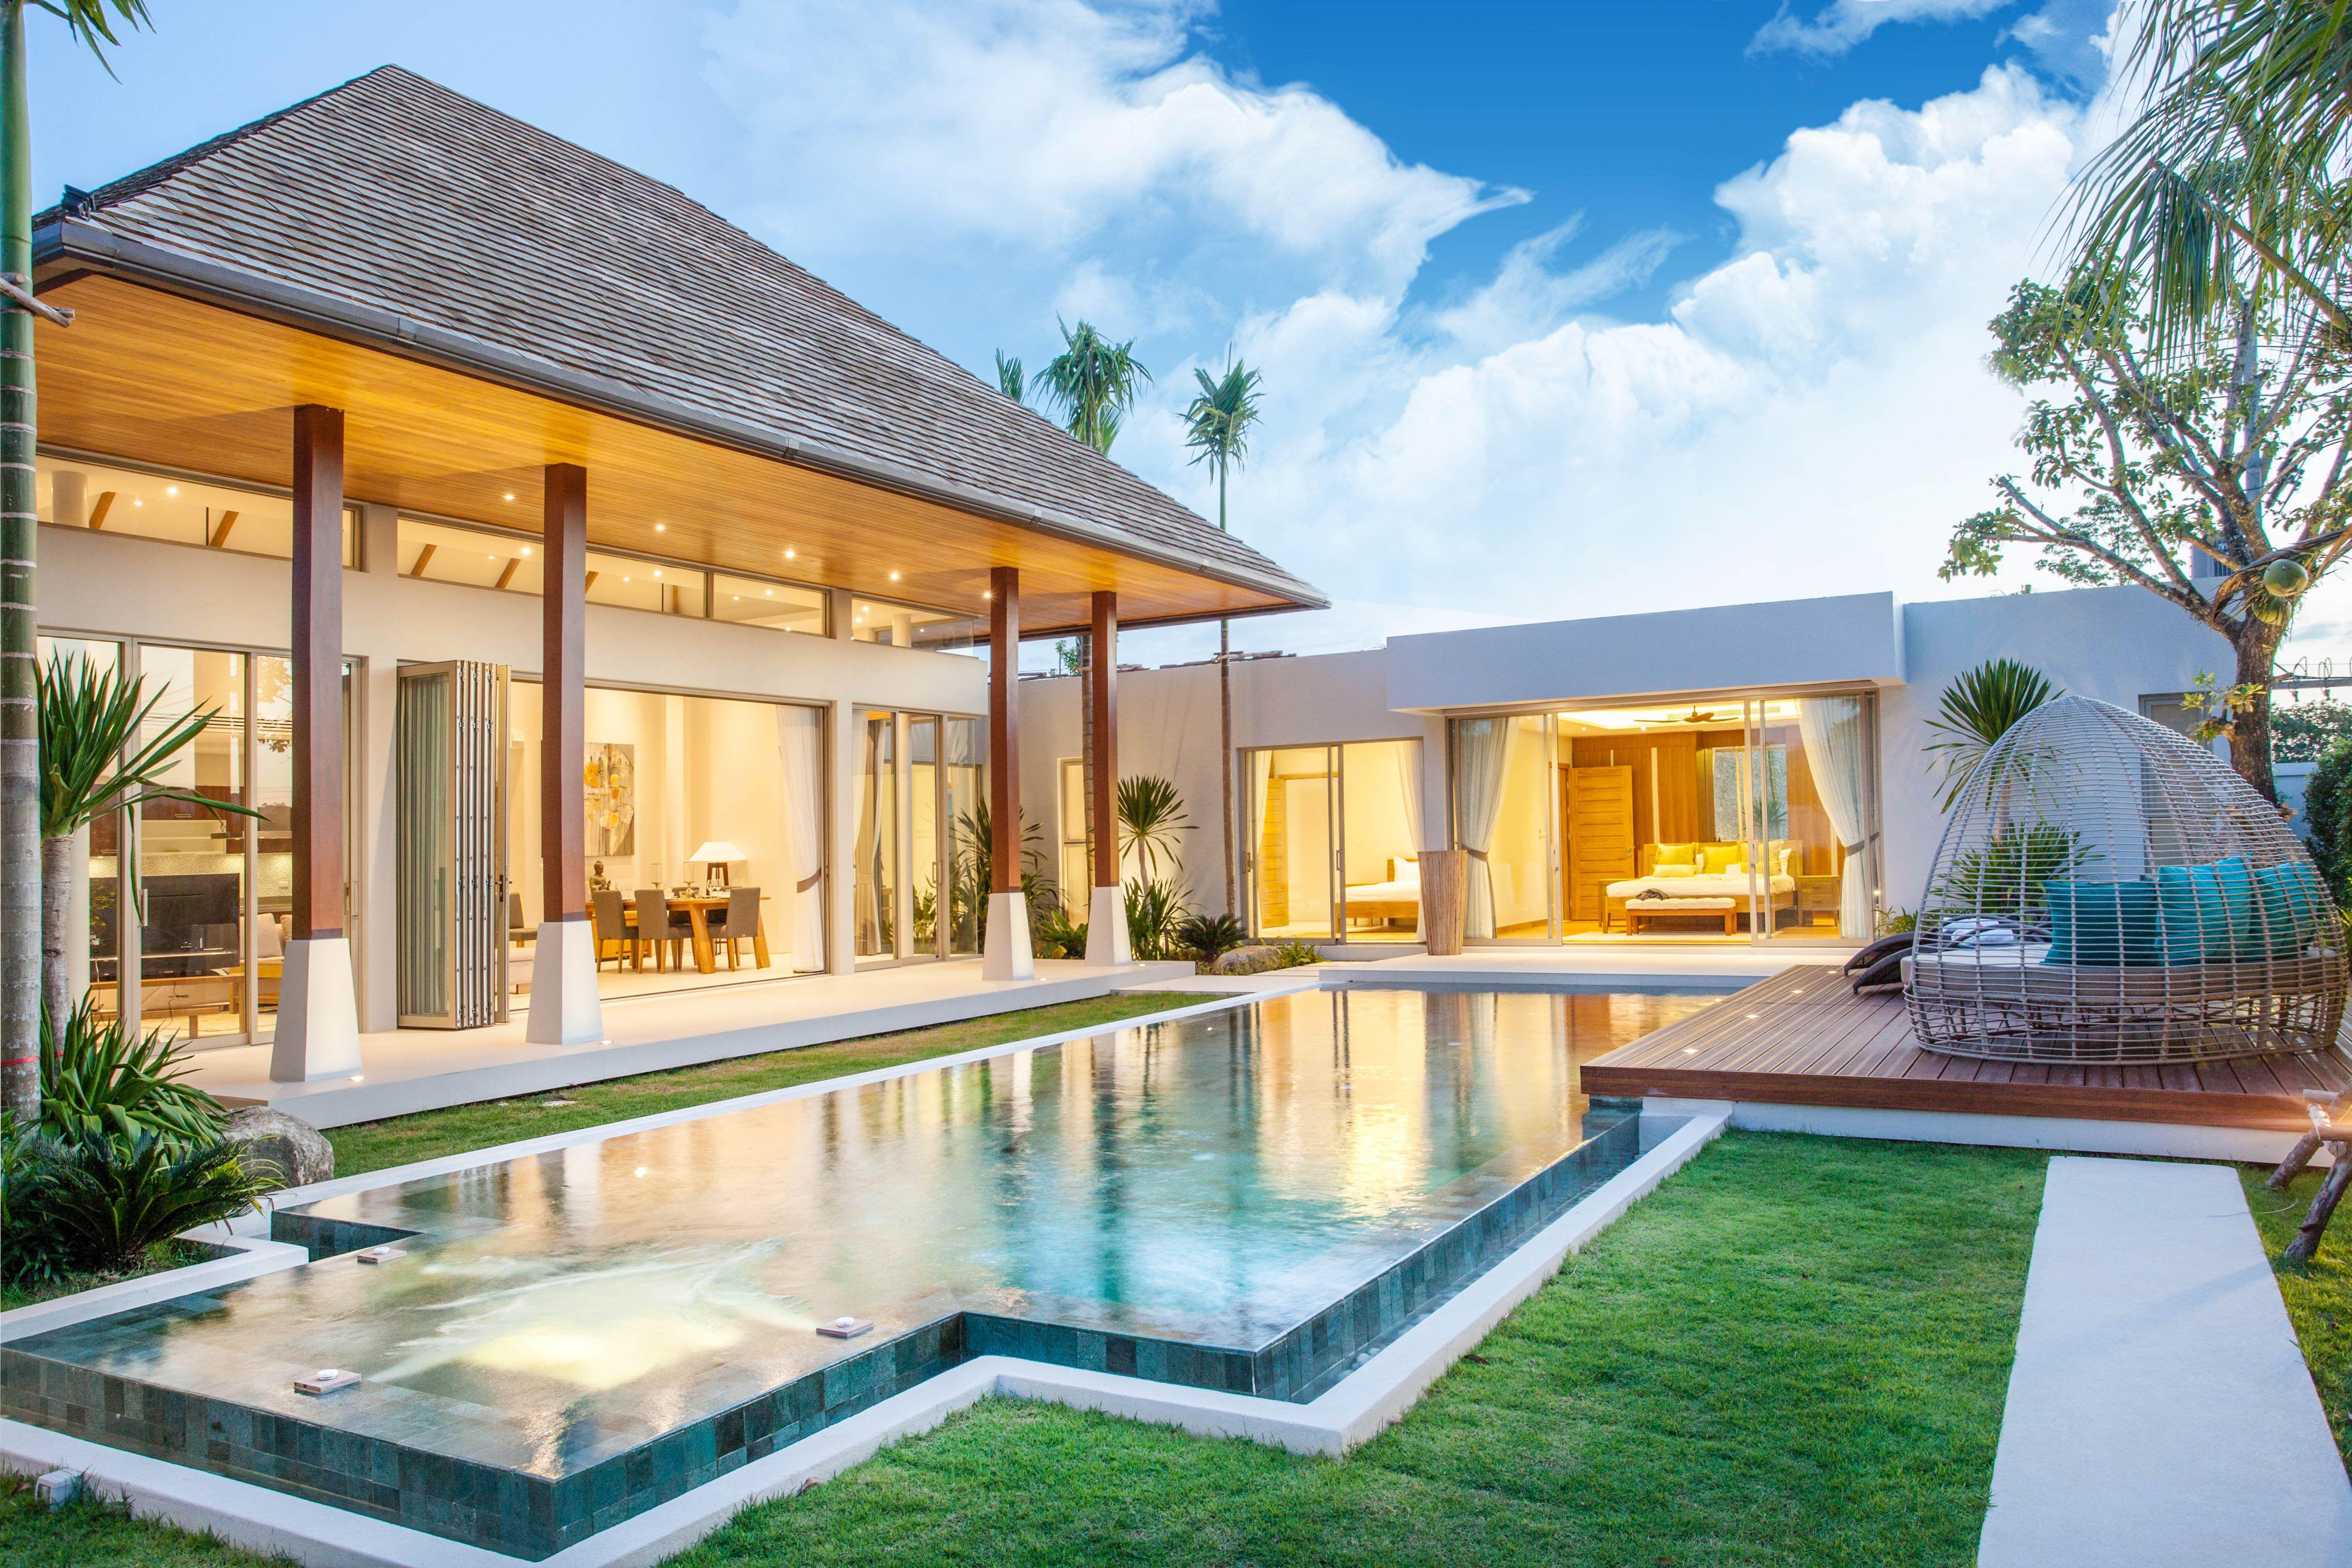 Arrendar ou comprar casa?